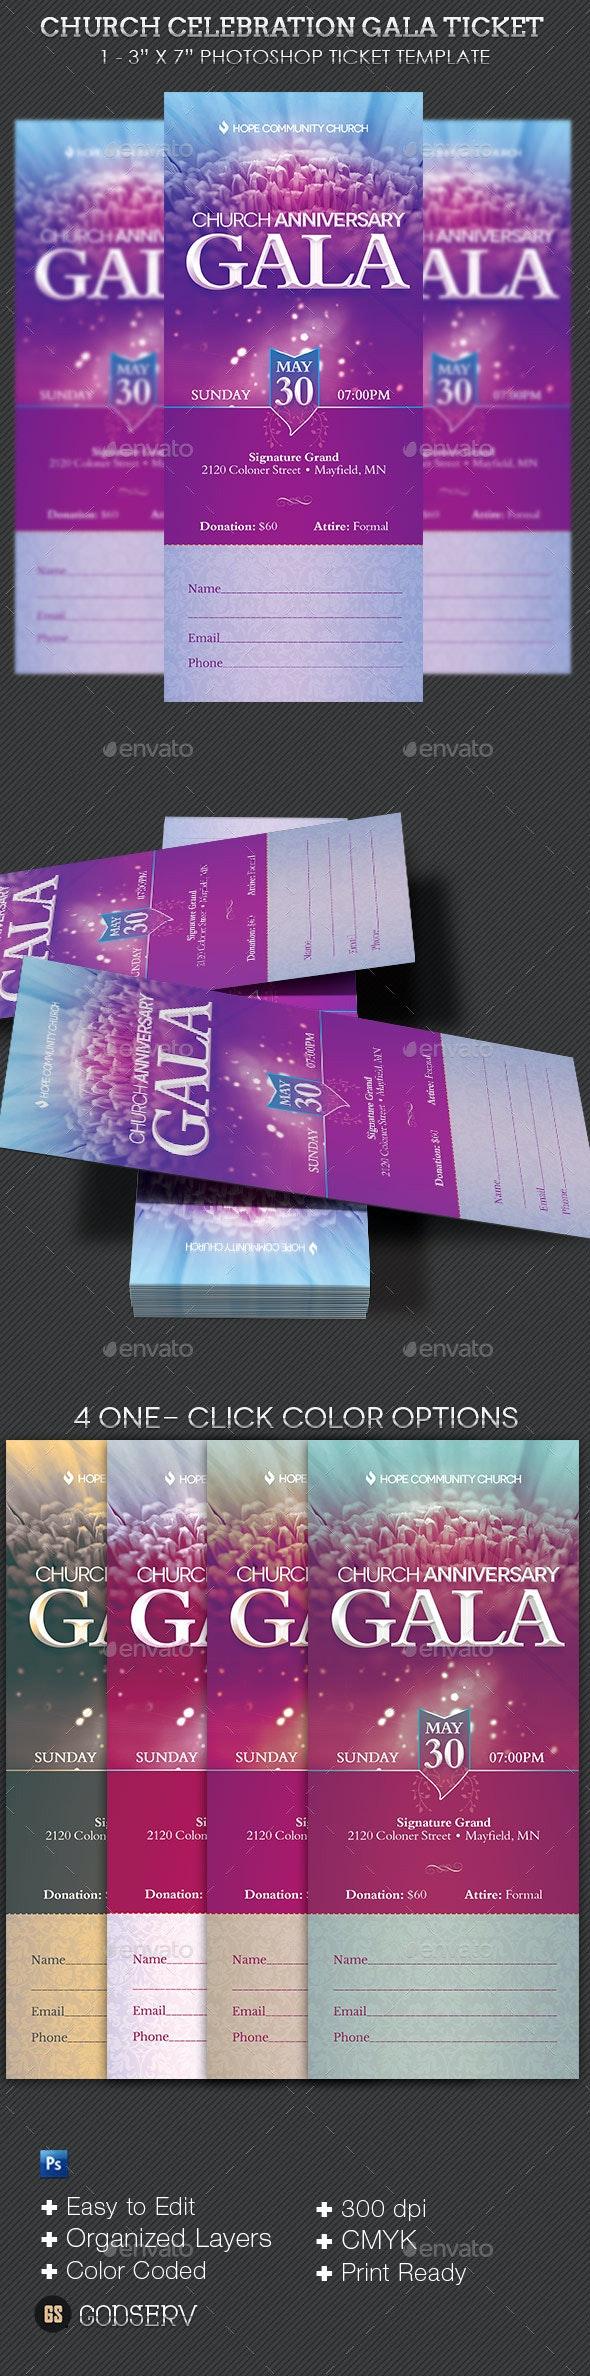 Church Celebration Gala Ticket Template - Miscellaneous Print Templates